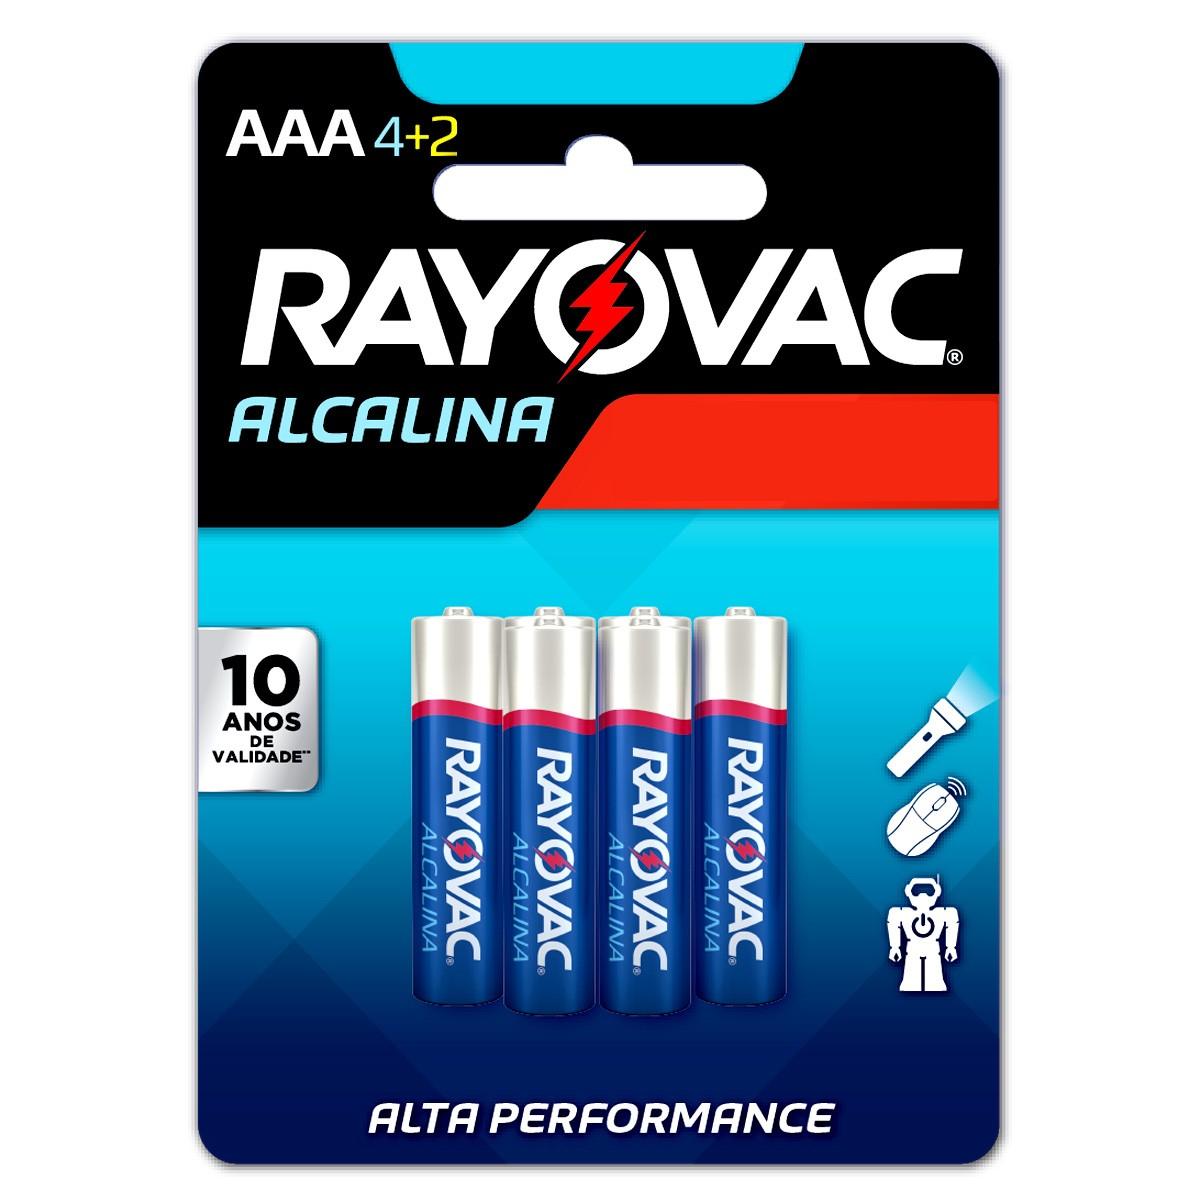 90 Pilhas AAA Alcalina RAYOVAC 15 cartelas